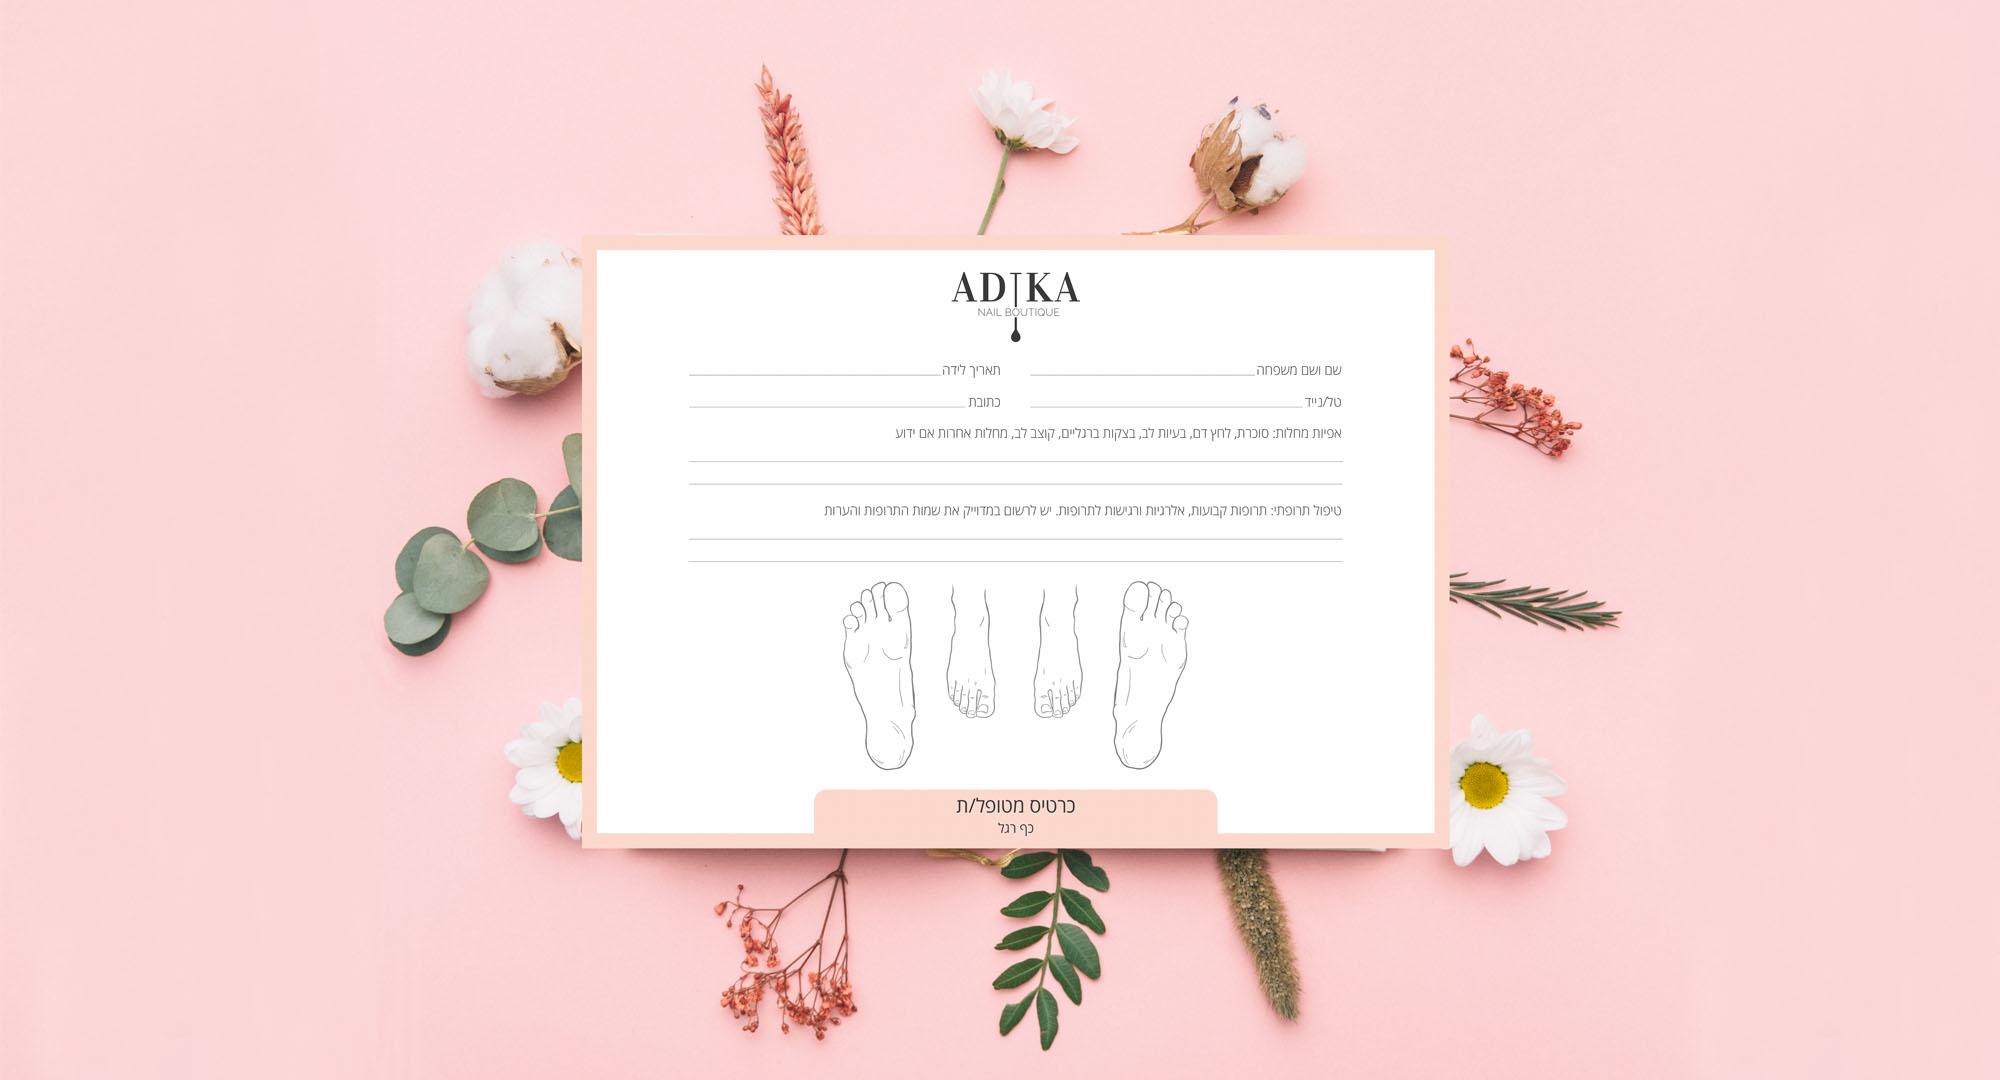 halo-design-adika-project-002